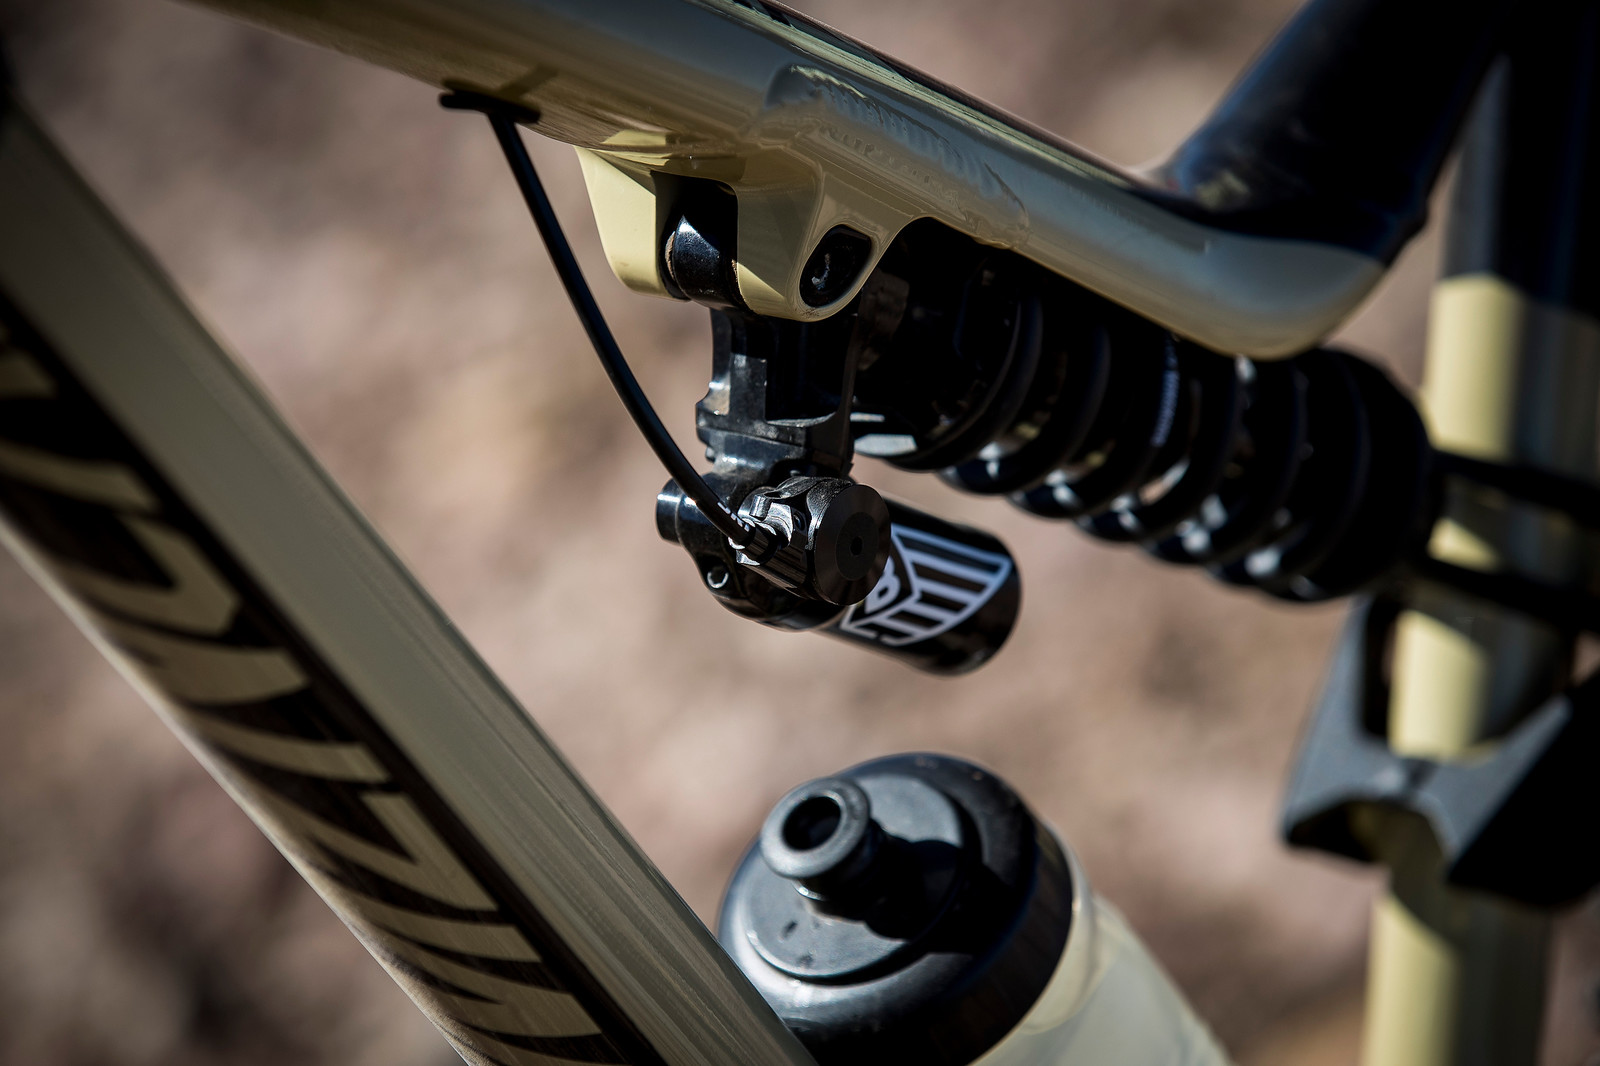 Cecile Ravanel's Commencal Meta AM V4.2 at the 2018 La Parva EWS - PIT BITS AND BIKES - Enduro World Series, Chile - Mountain Biking Pictures - Vital MTB